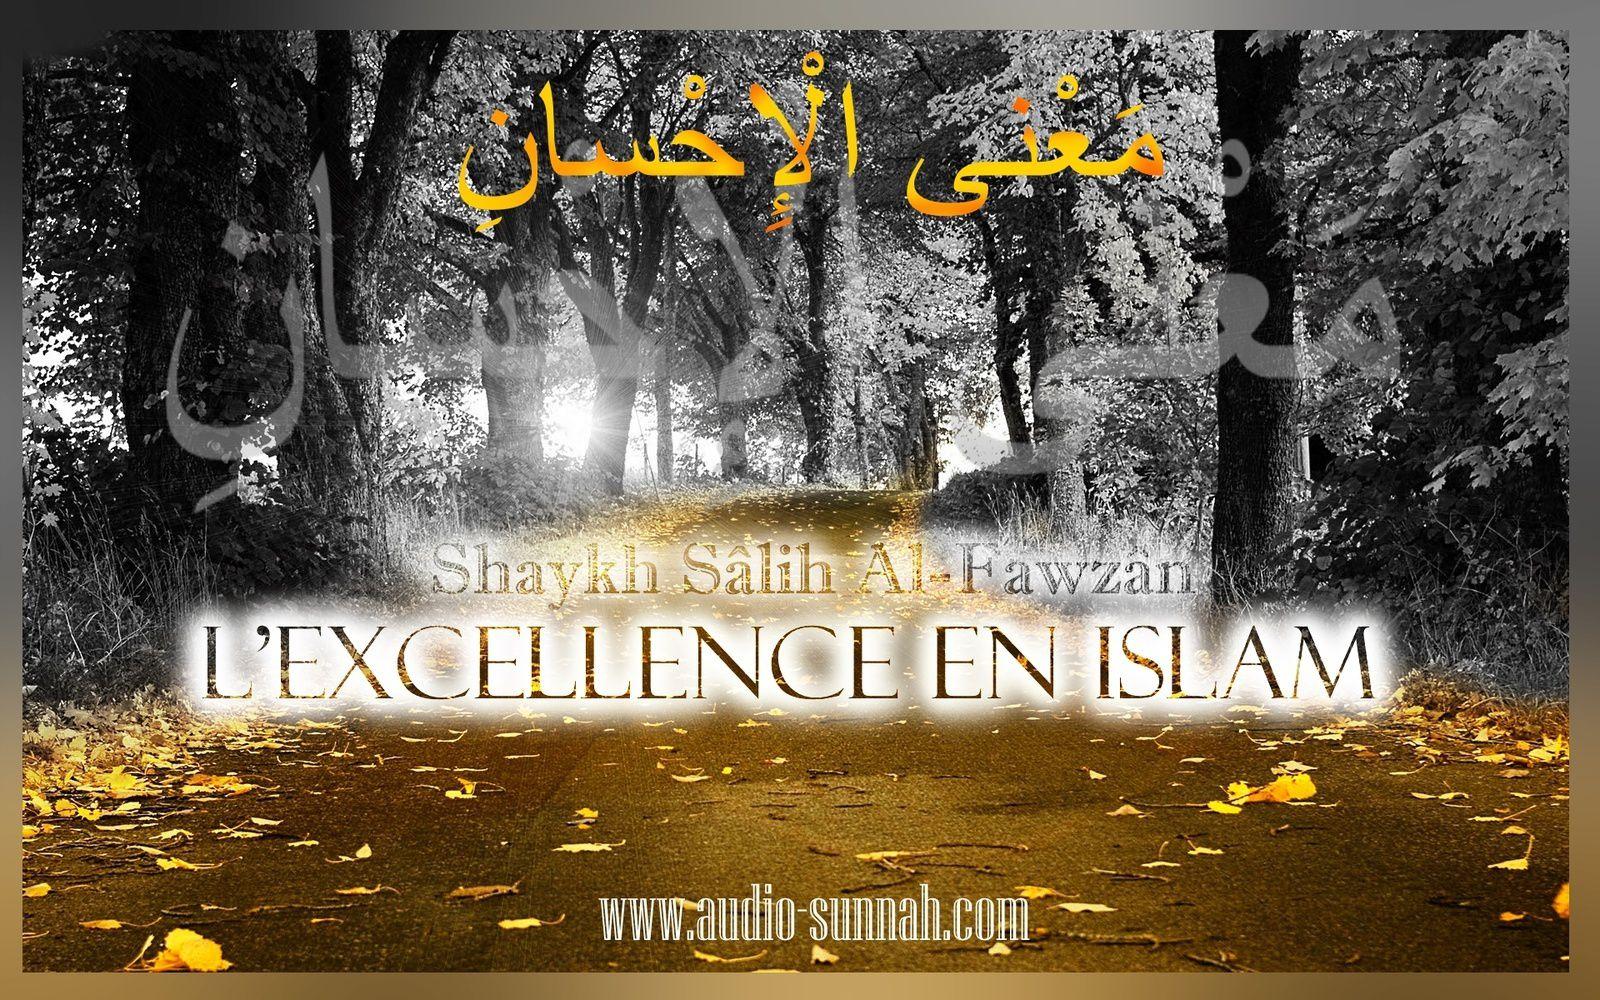 L'excellence en islâm ! Shaykh Sâlih Al-Fawzân